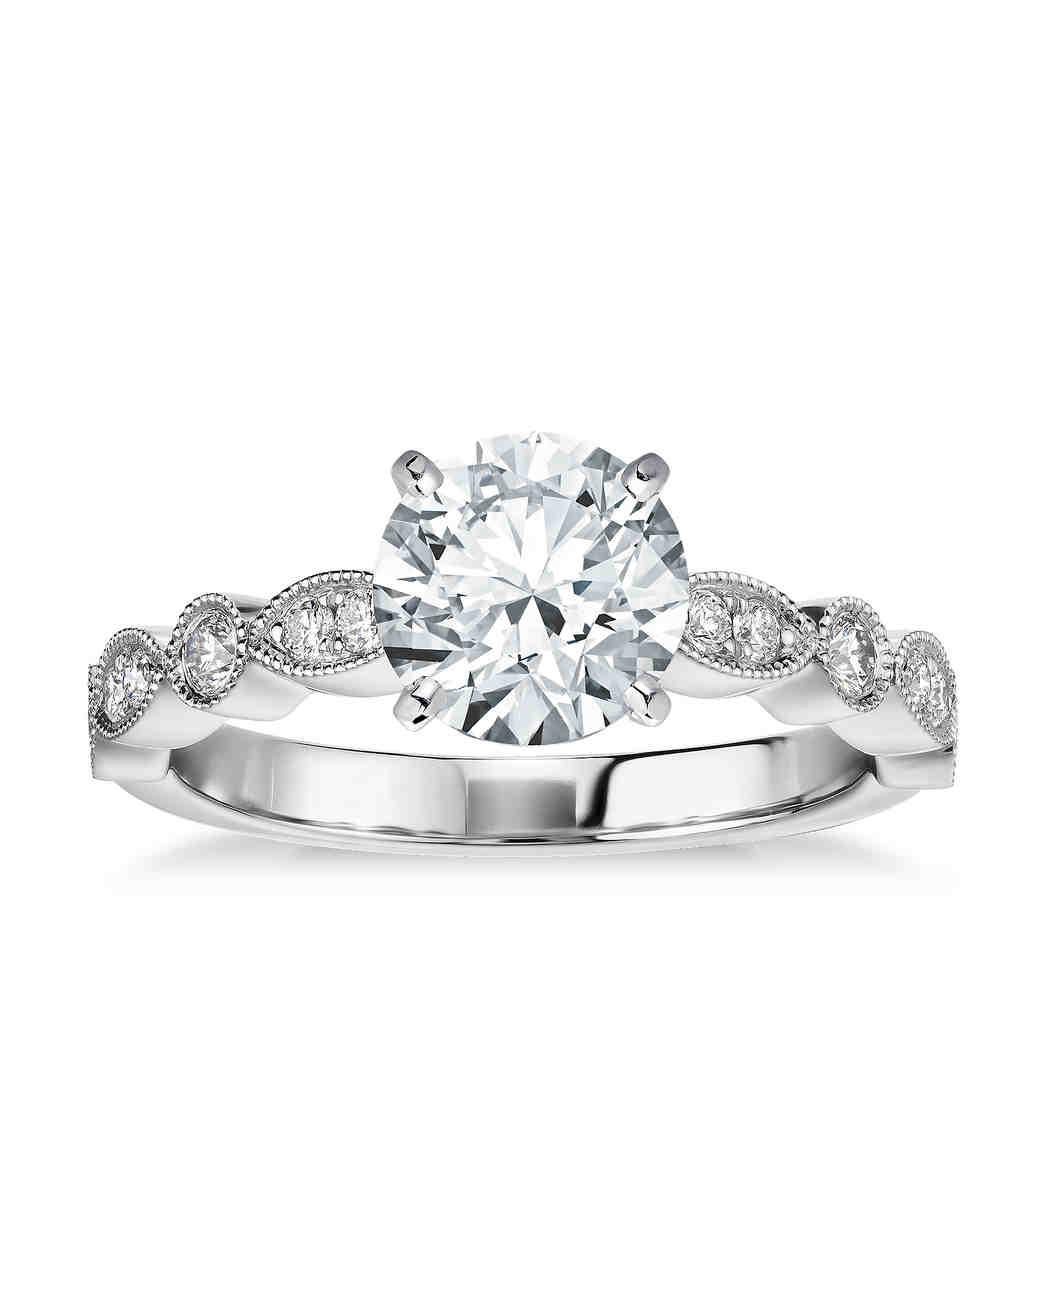 Blue Nile White Gold Engagement Ring